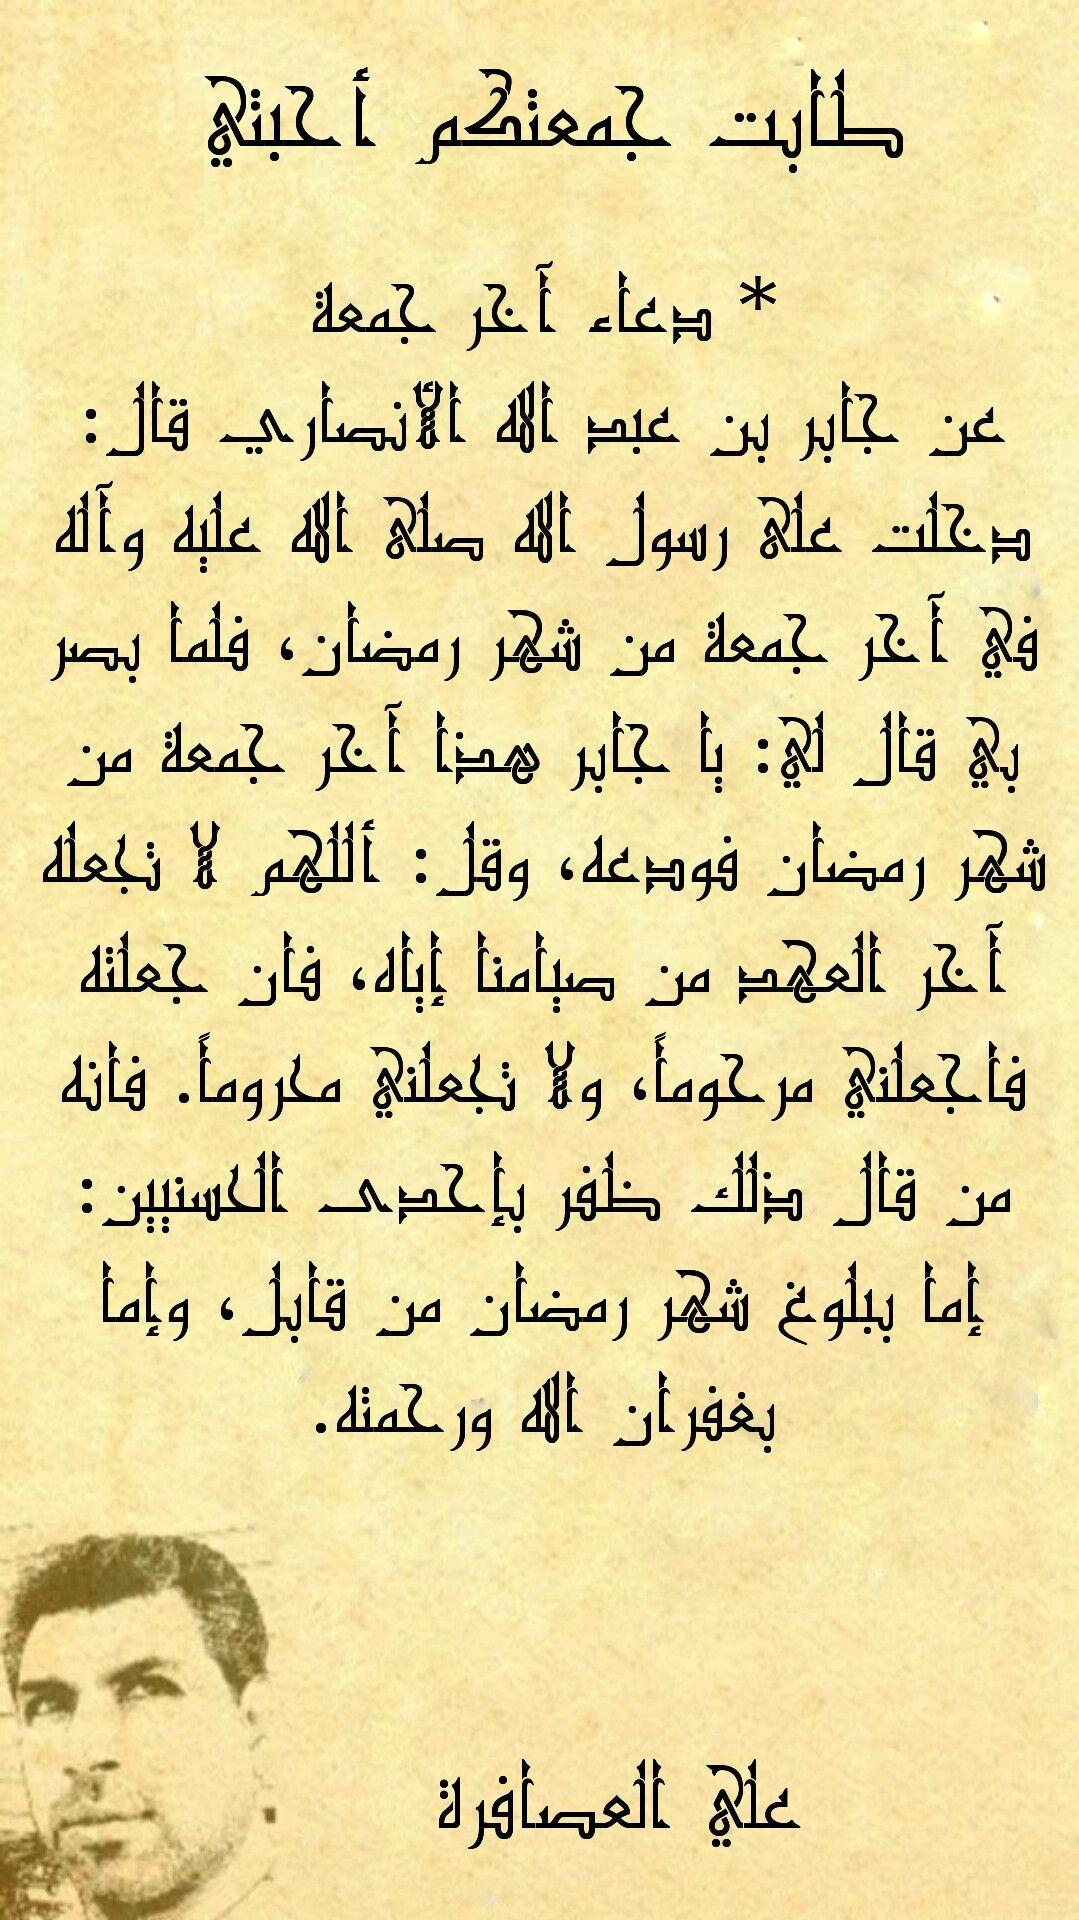 دعاء آخر جمعة من شهر رمضان Doua